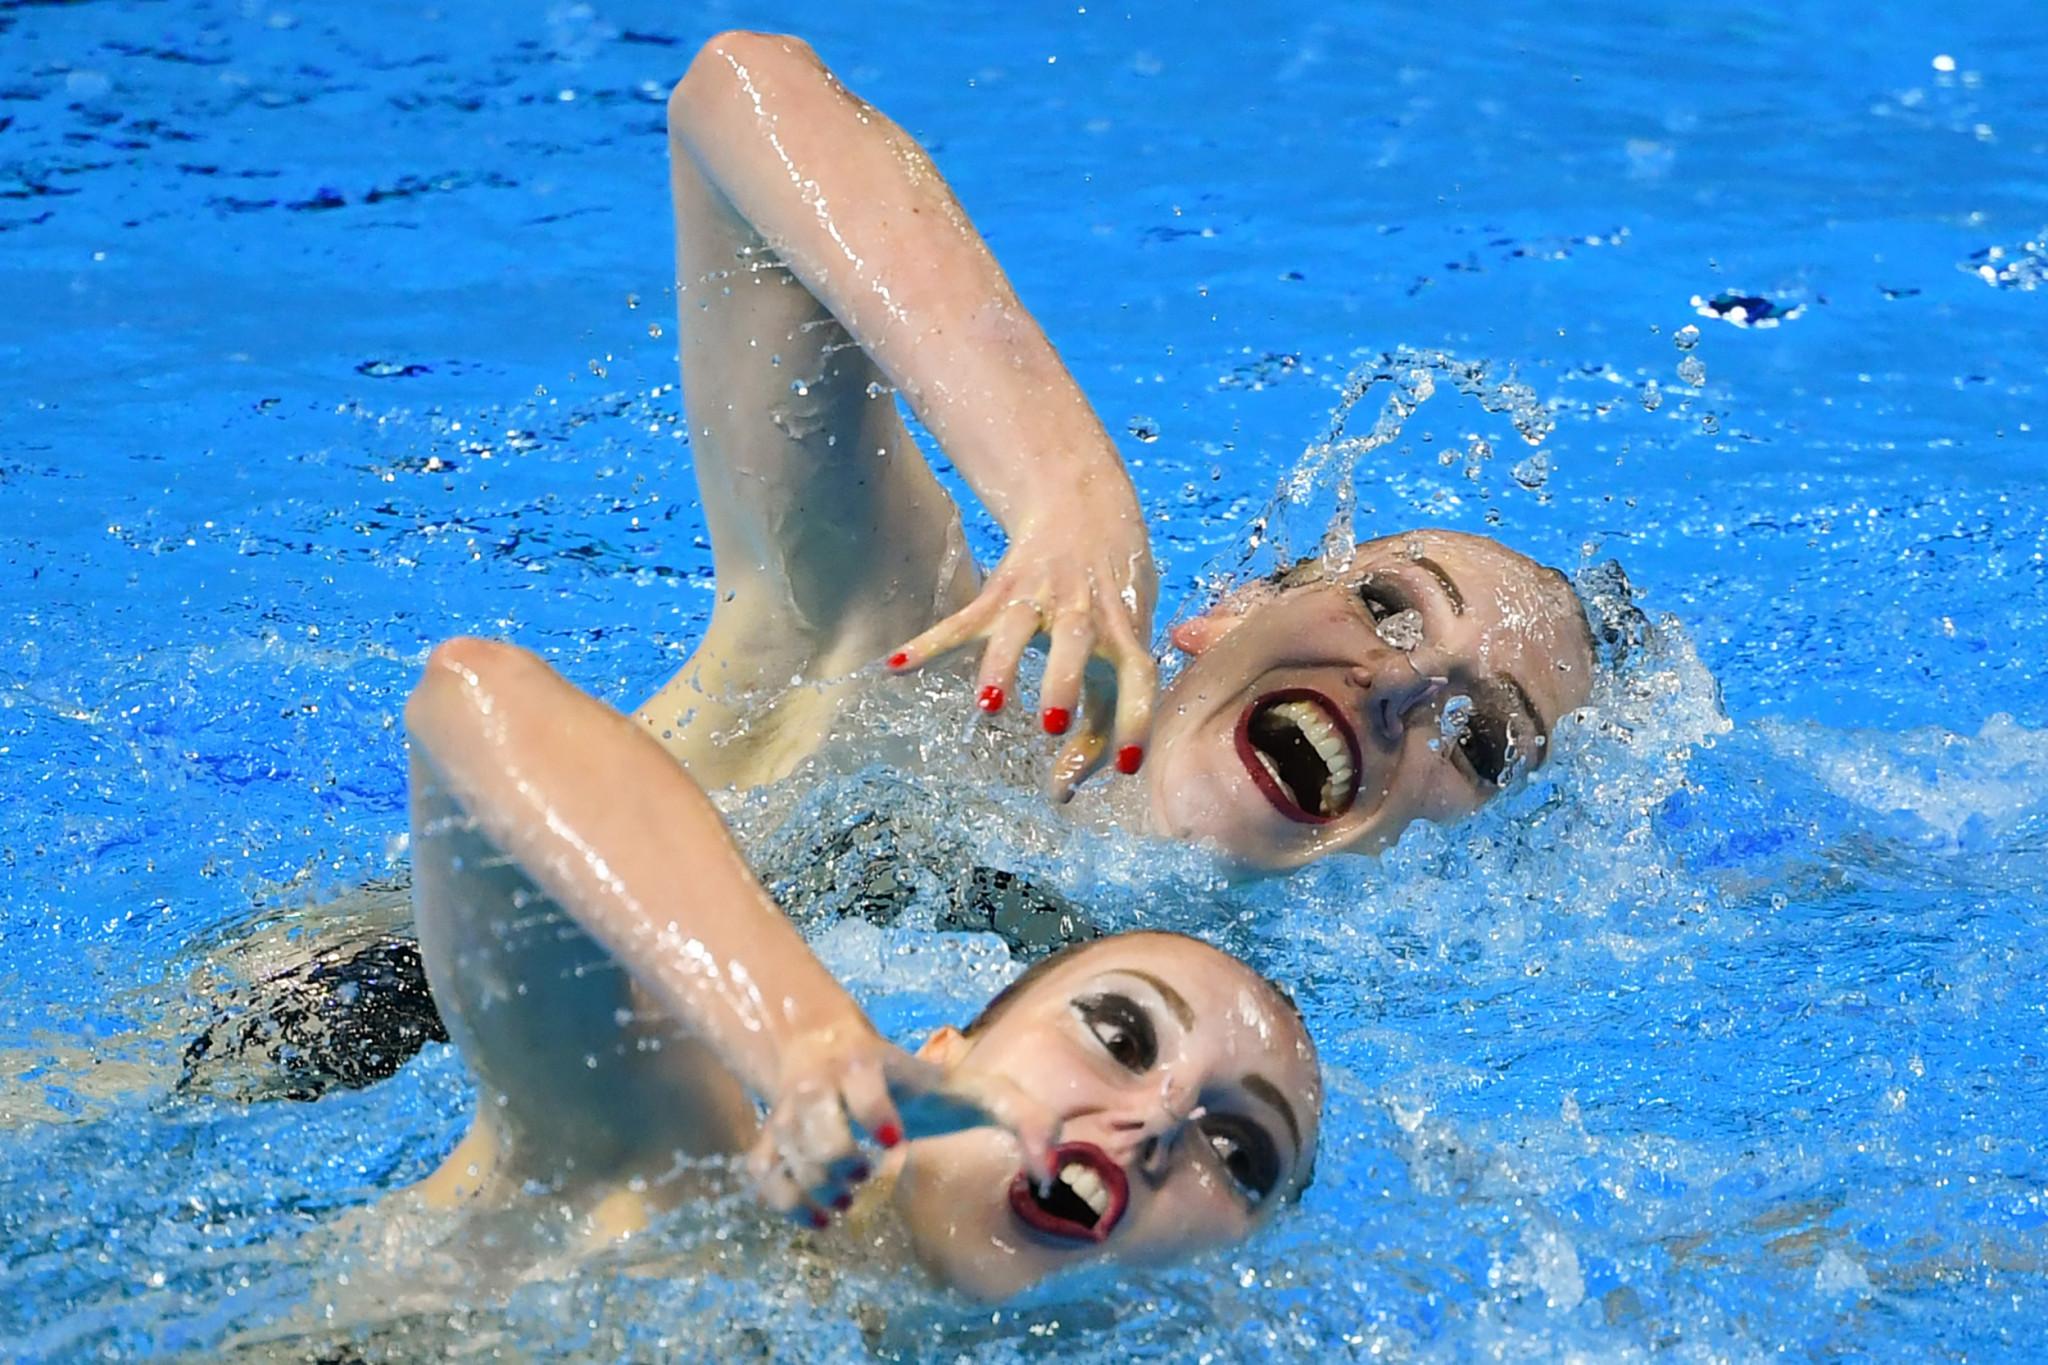 Svetlana Romashina and Svetlana Kolesnichenko were joint winner in artistic swimming as Russia won both the men's and women's awards ©Getty Images